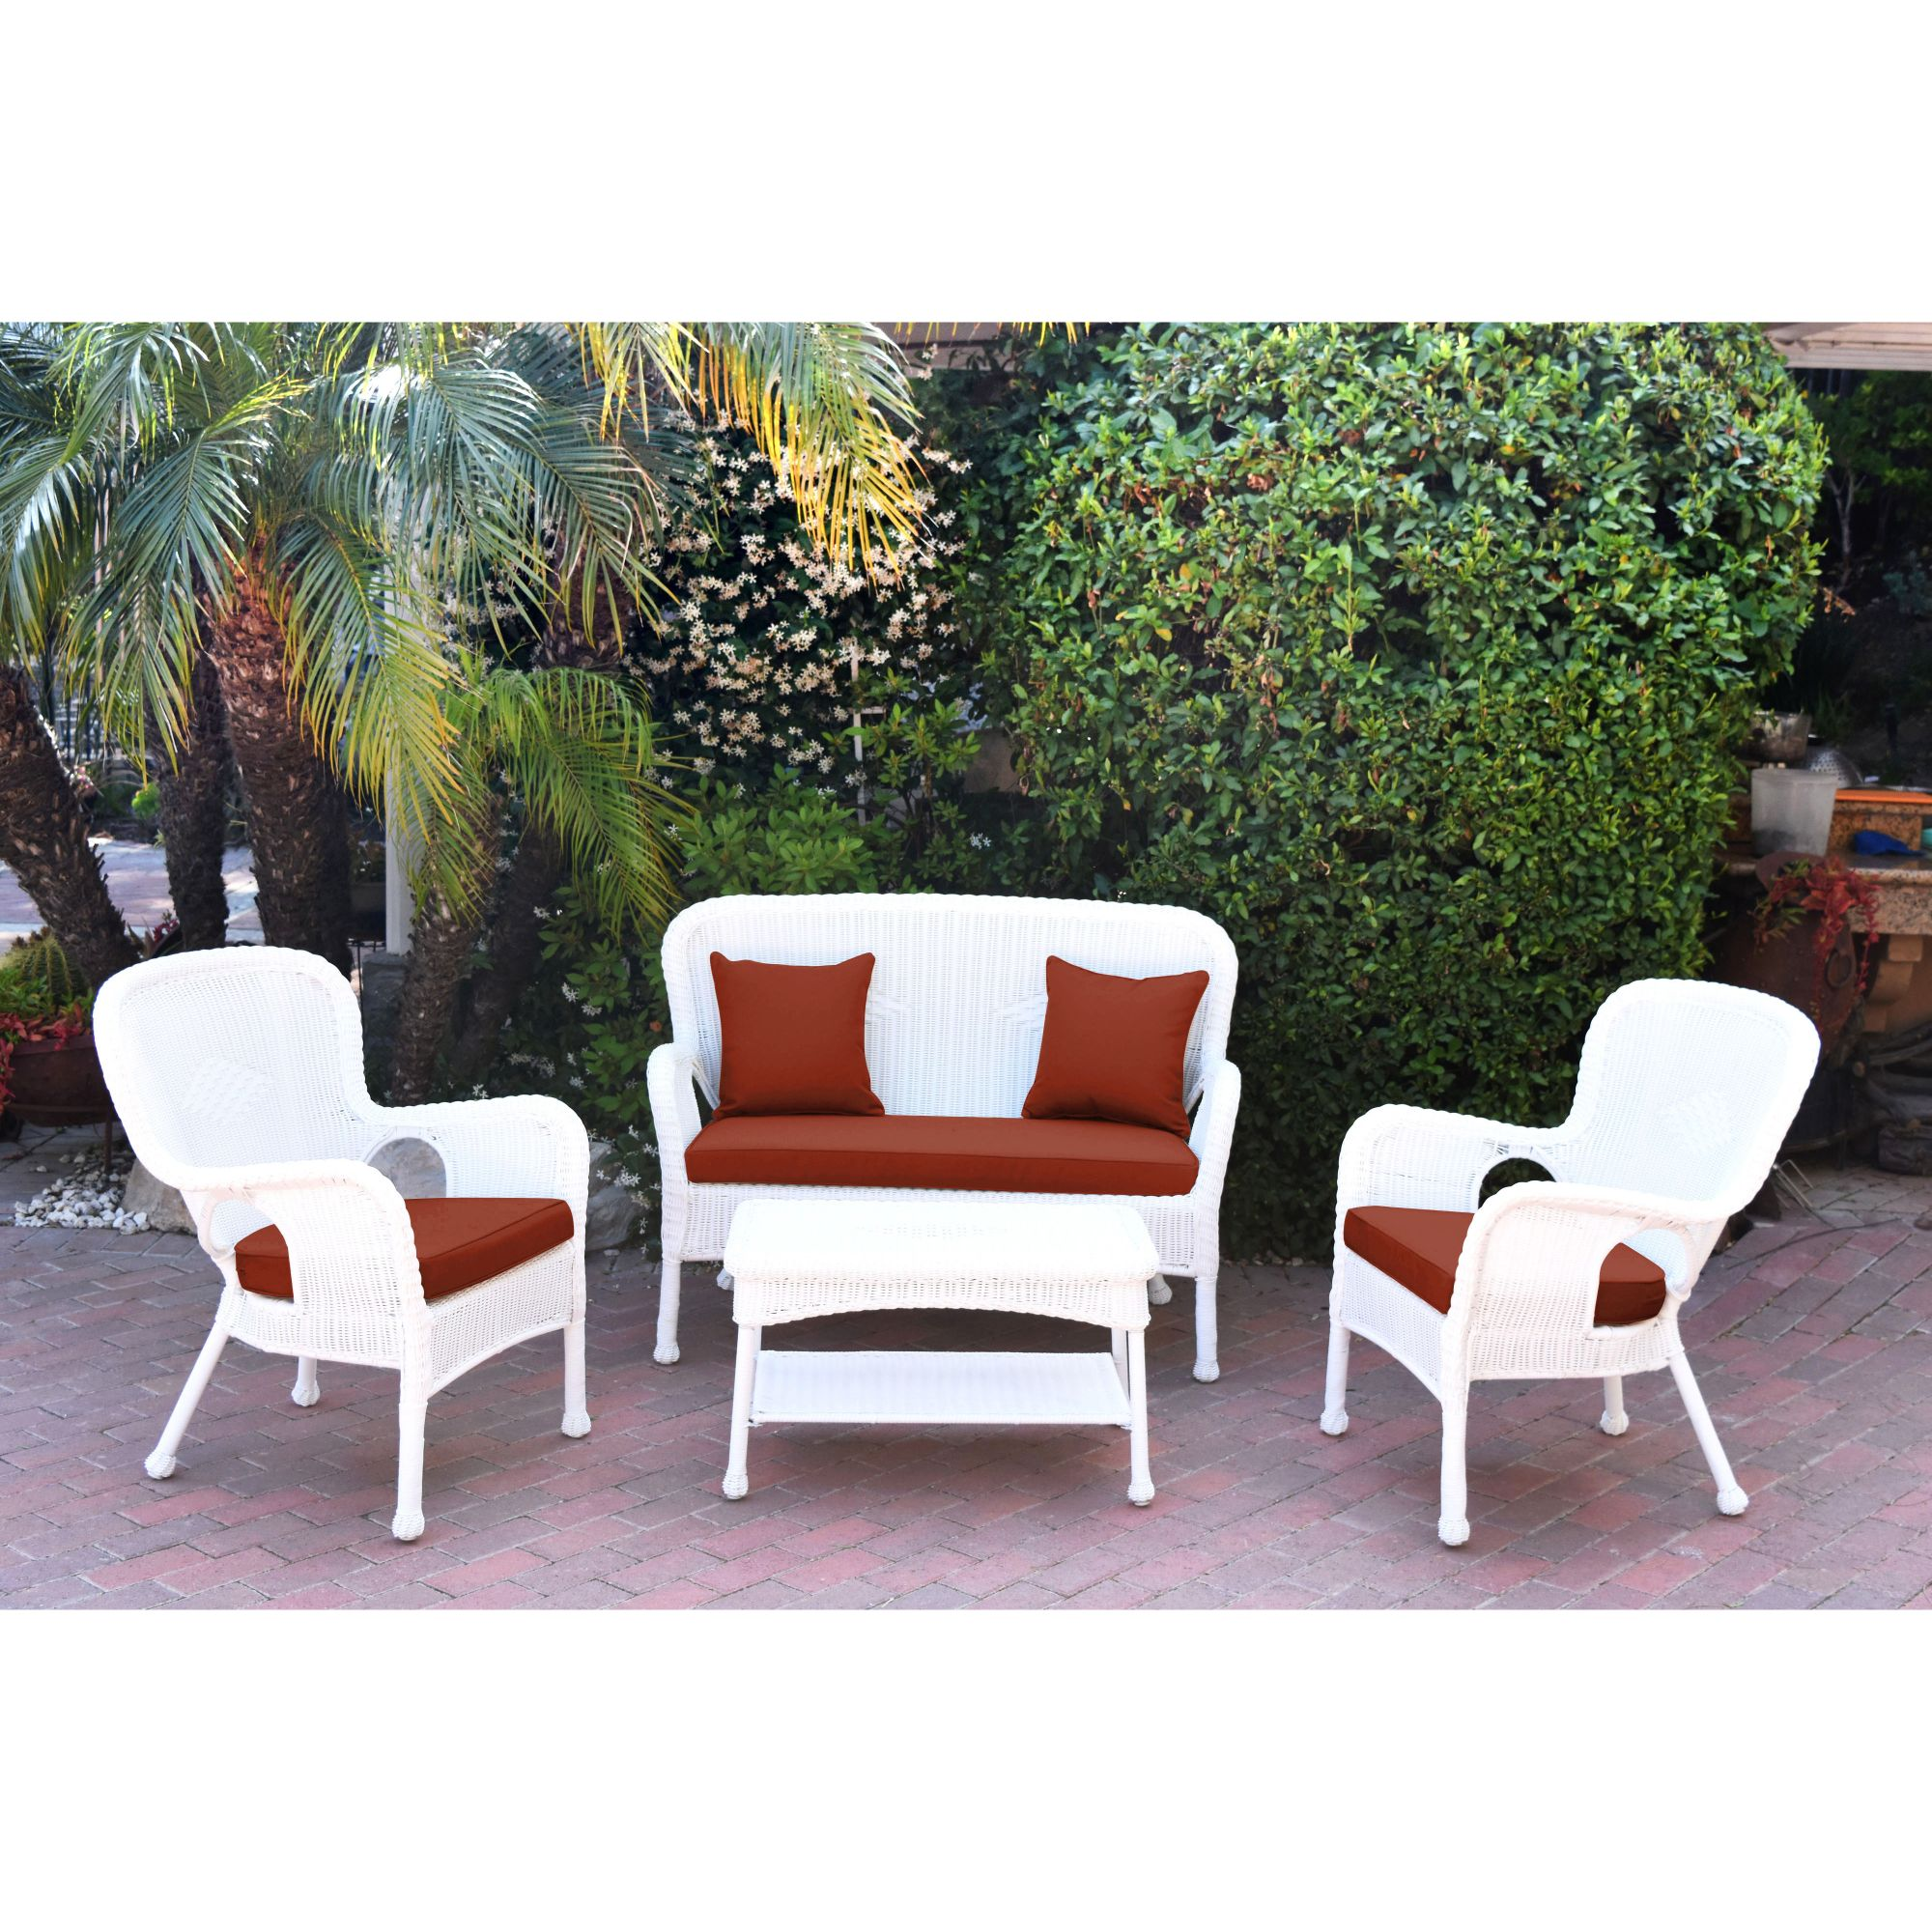 4 piece white wicker outdoor furniture patio conversation set brick red cushions